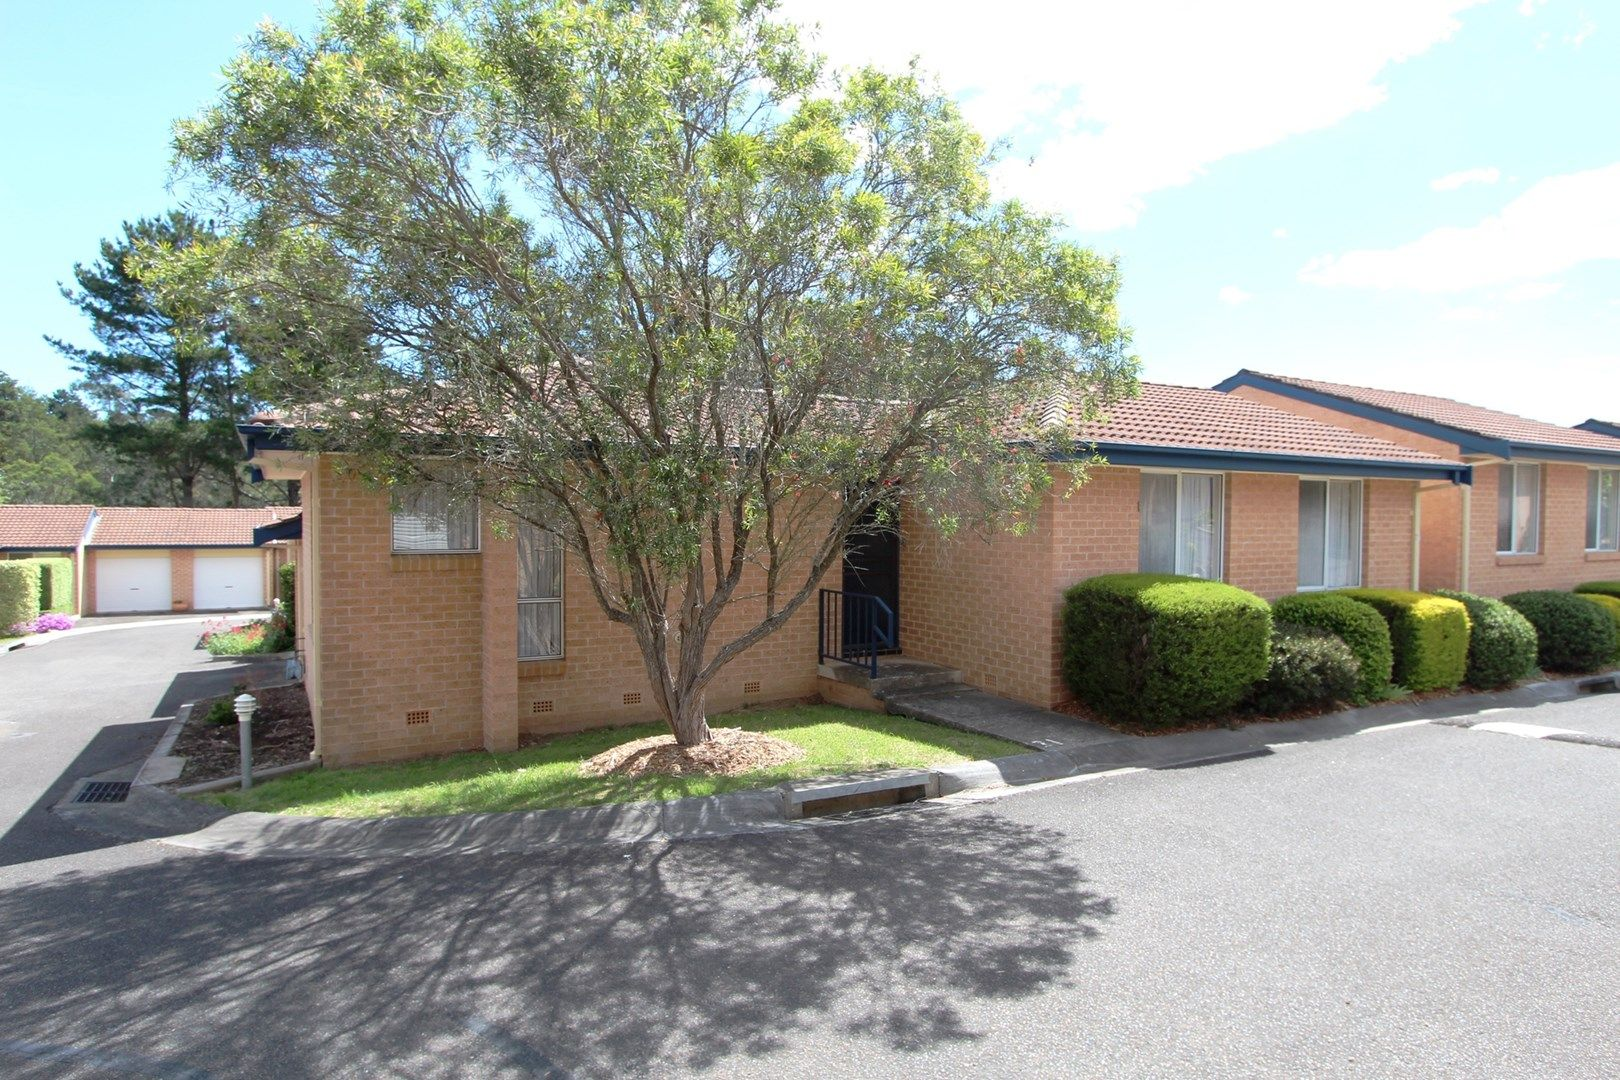 21/61 Kirkham Street, Moss Vale NSW 2577, Image 0